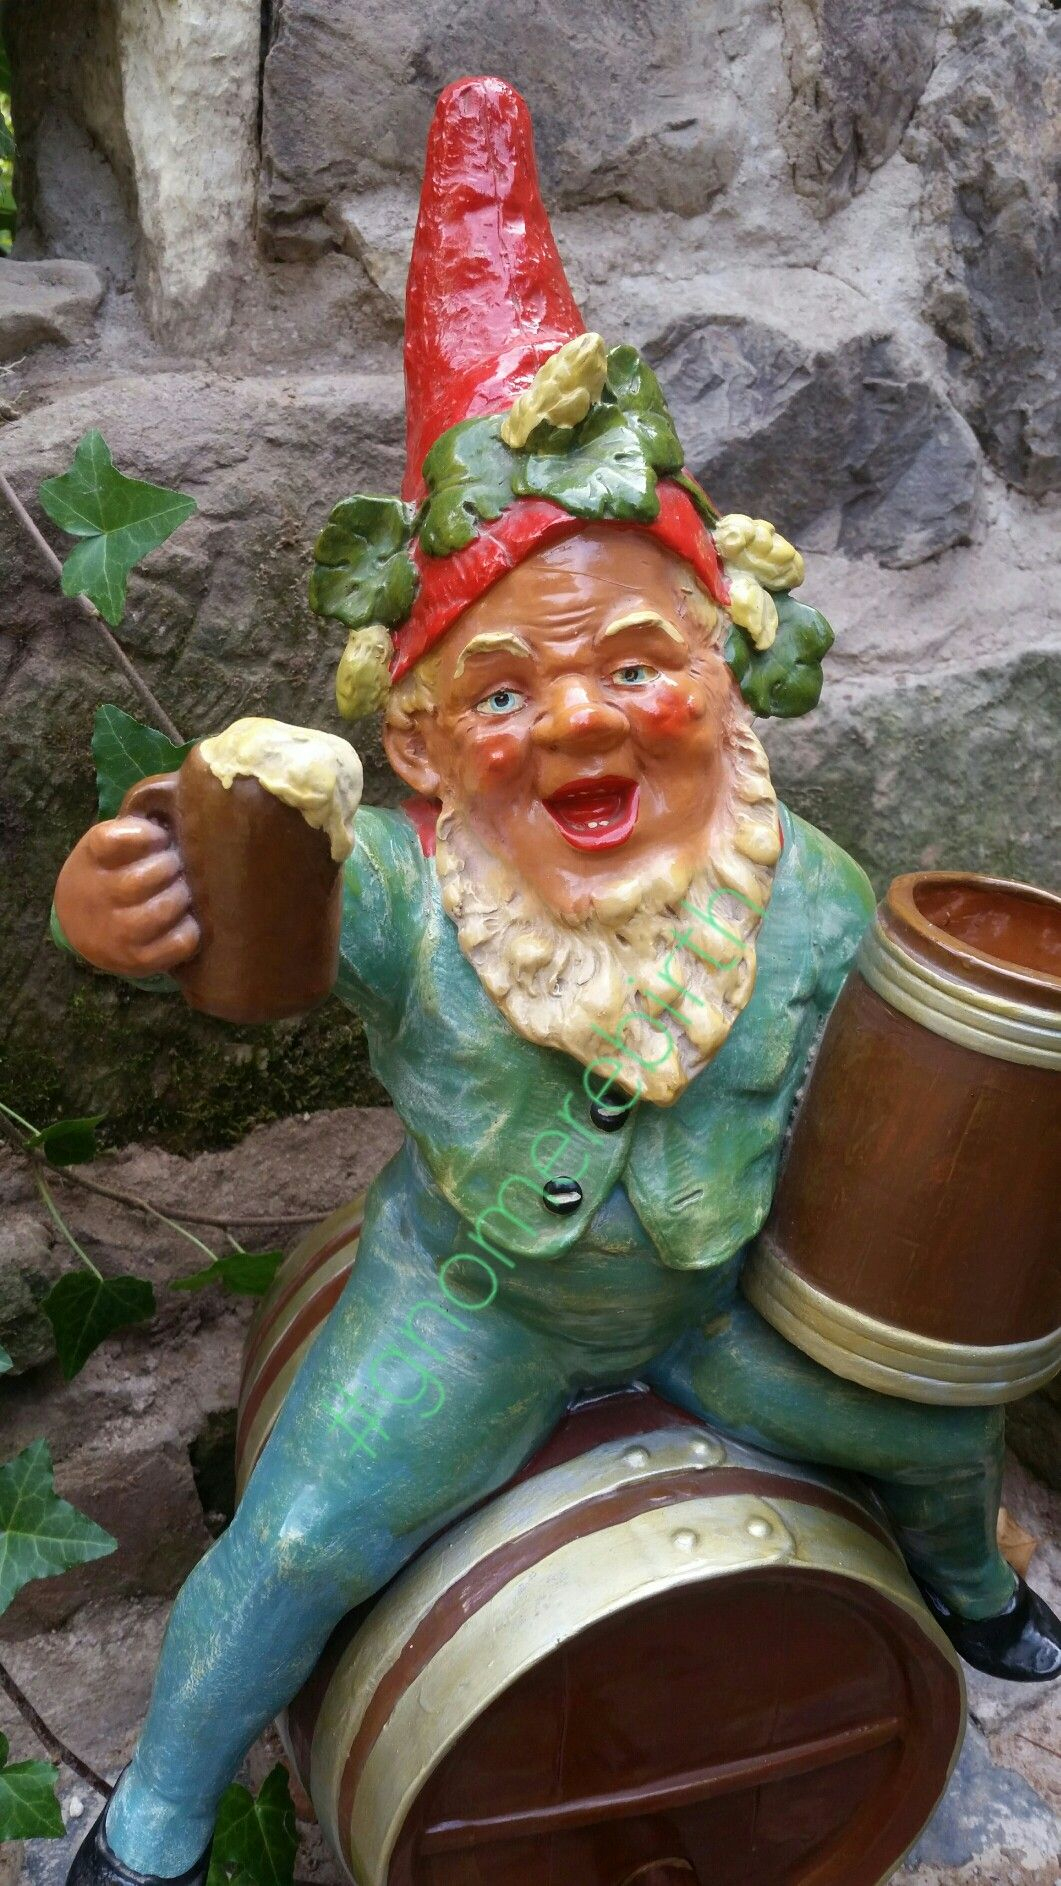 Pin Von Deborah Rieke Auf Gnomes In 2020 | Gartenzwerg, Gnome à Nain De Jardin Fuck